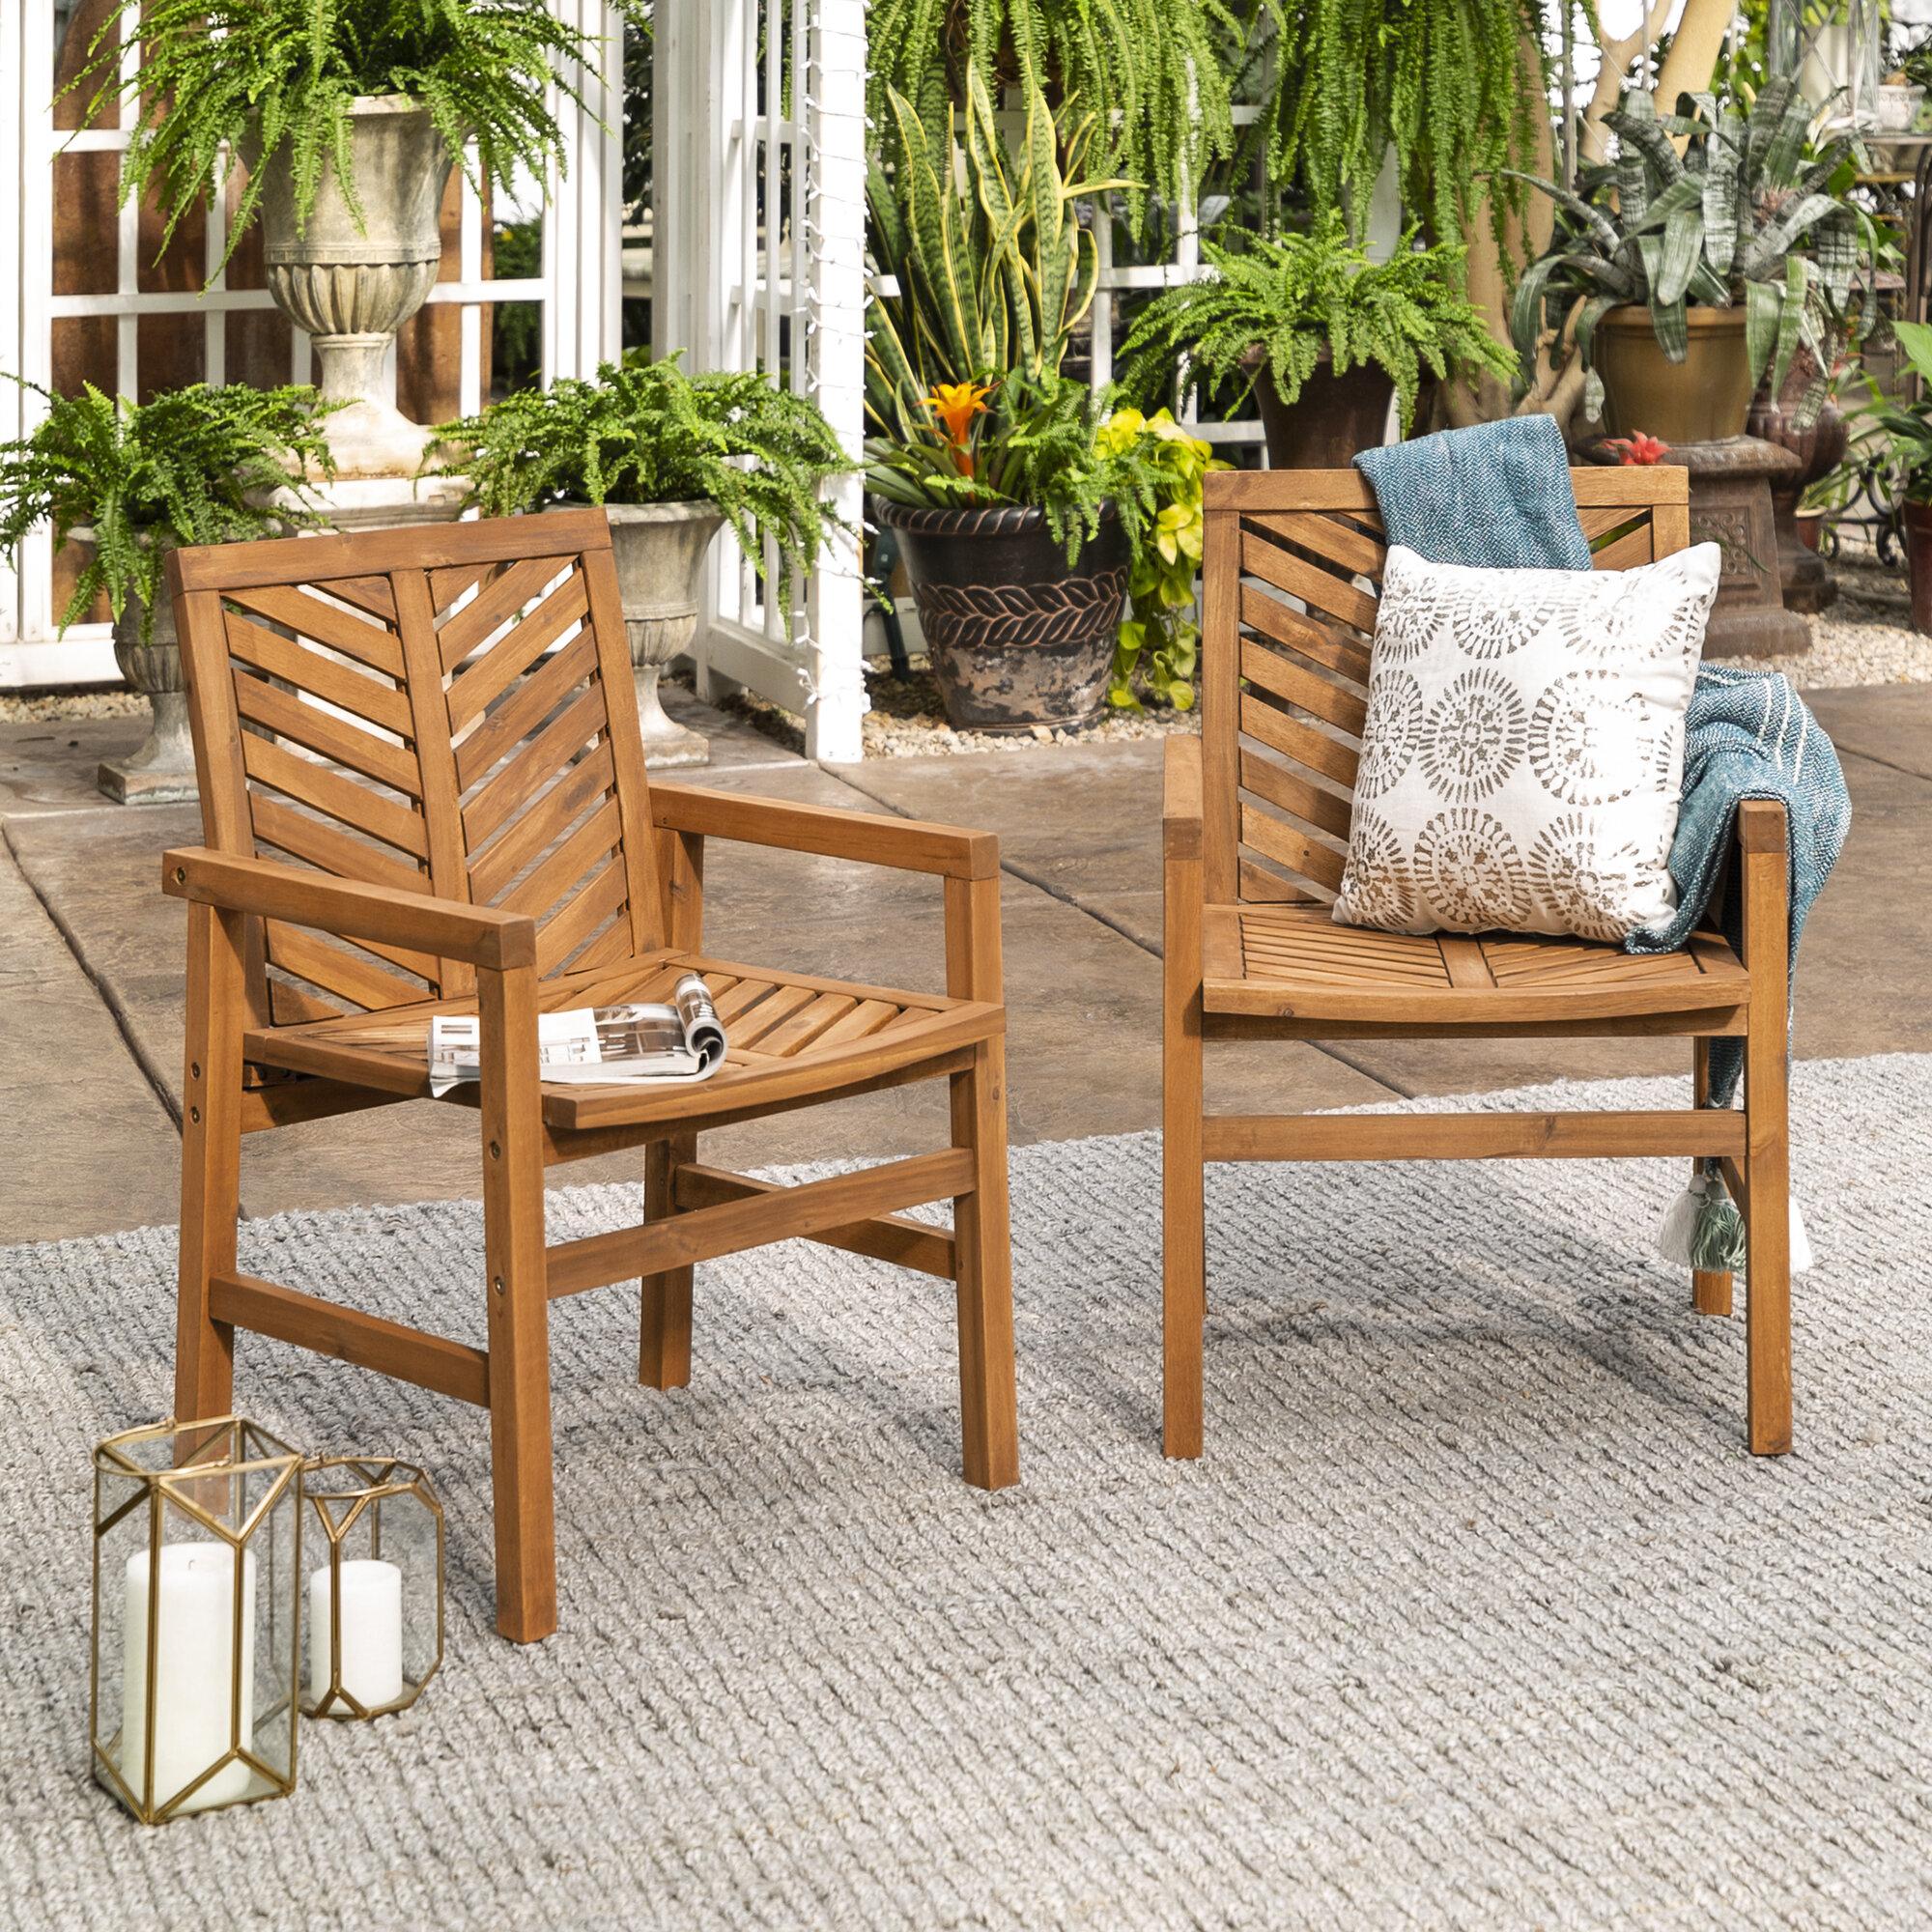 Skoog Chevron Patio Dining Chair With Skoog Chevron Wooden Garden Benches (View 8 of 25)